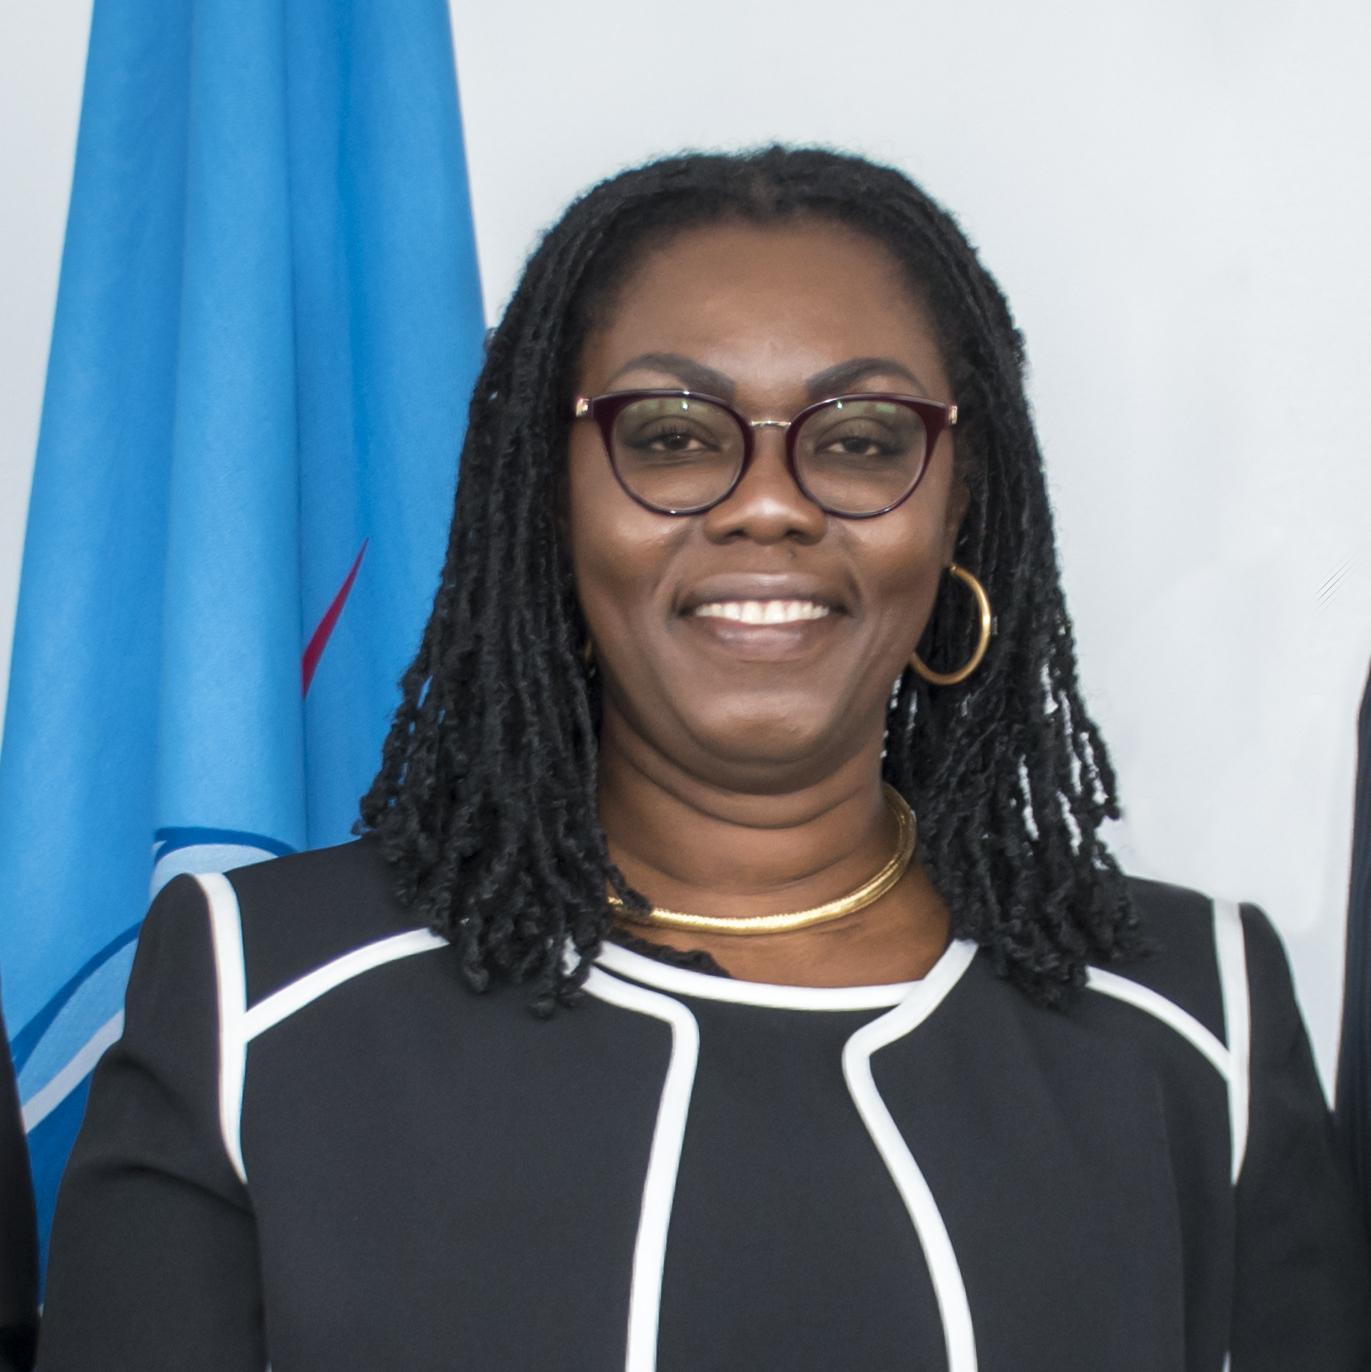 Kan Dapaah, Ursula Owusu dropped from Akufo-Addo's Cabinet list. 45